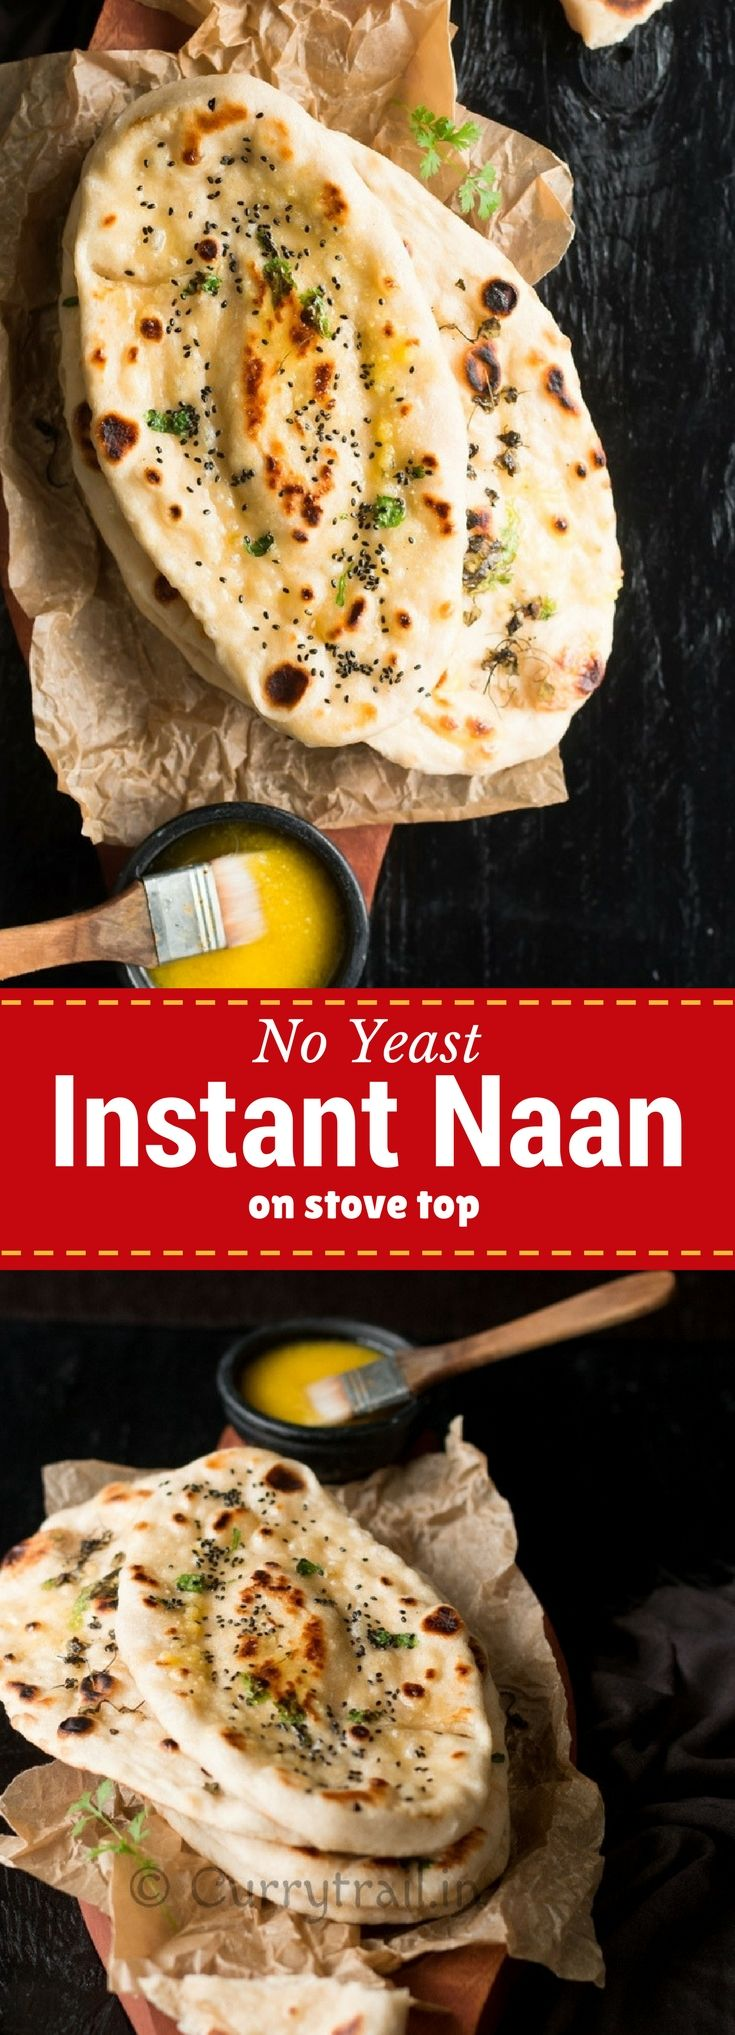 No yeast Instant Naan pin